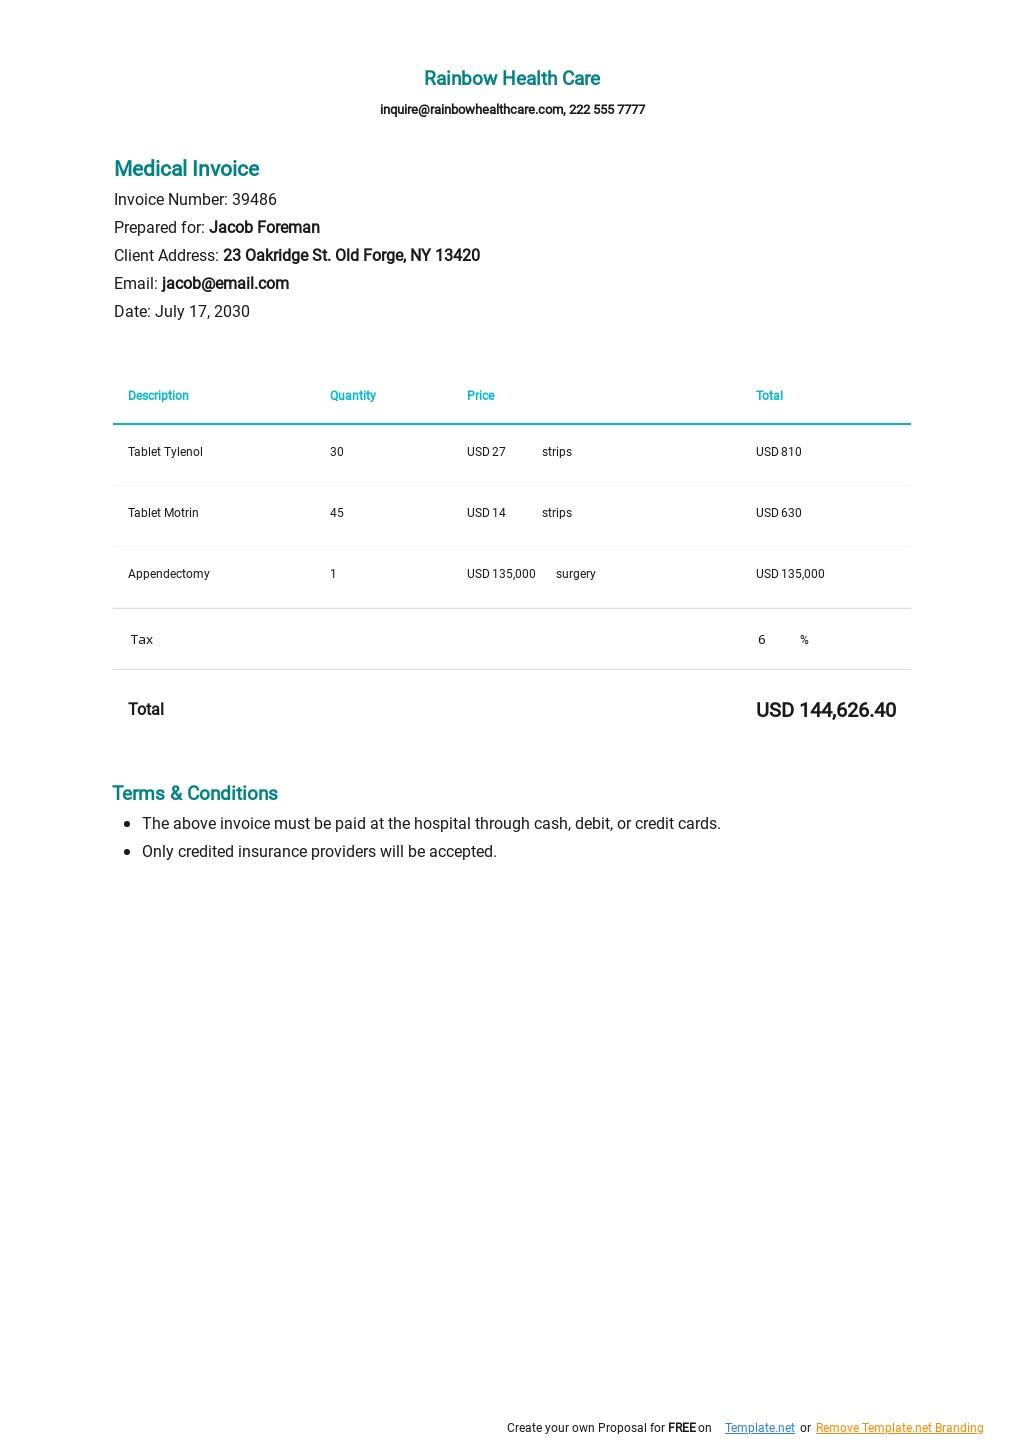 Sample Medical Invoice Template.jpe